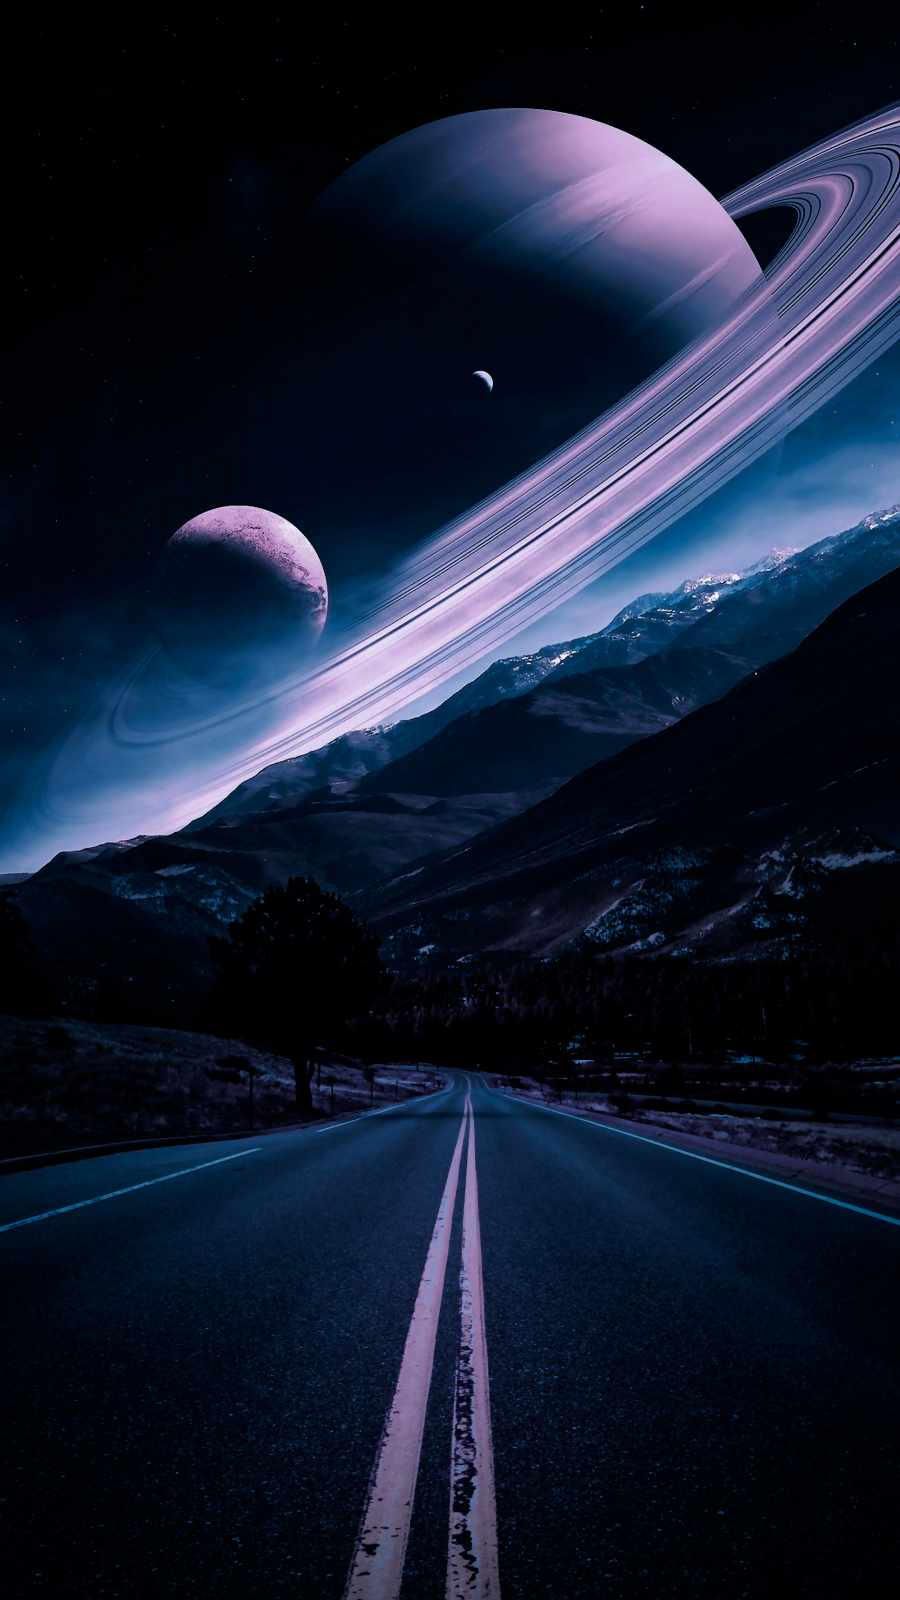 Extraterrestrial Road